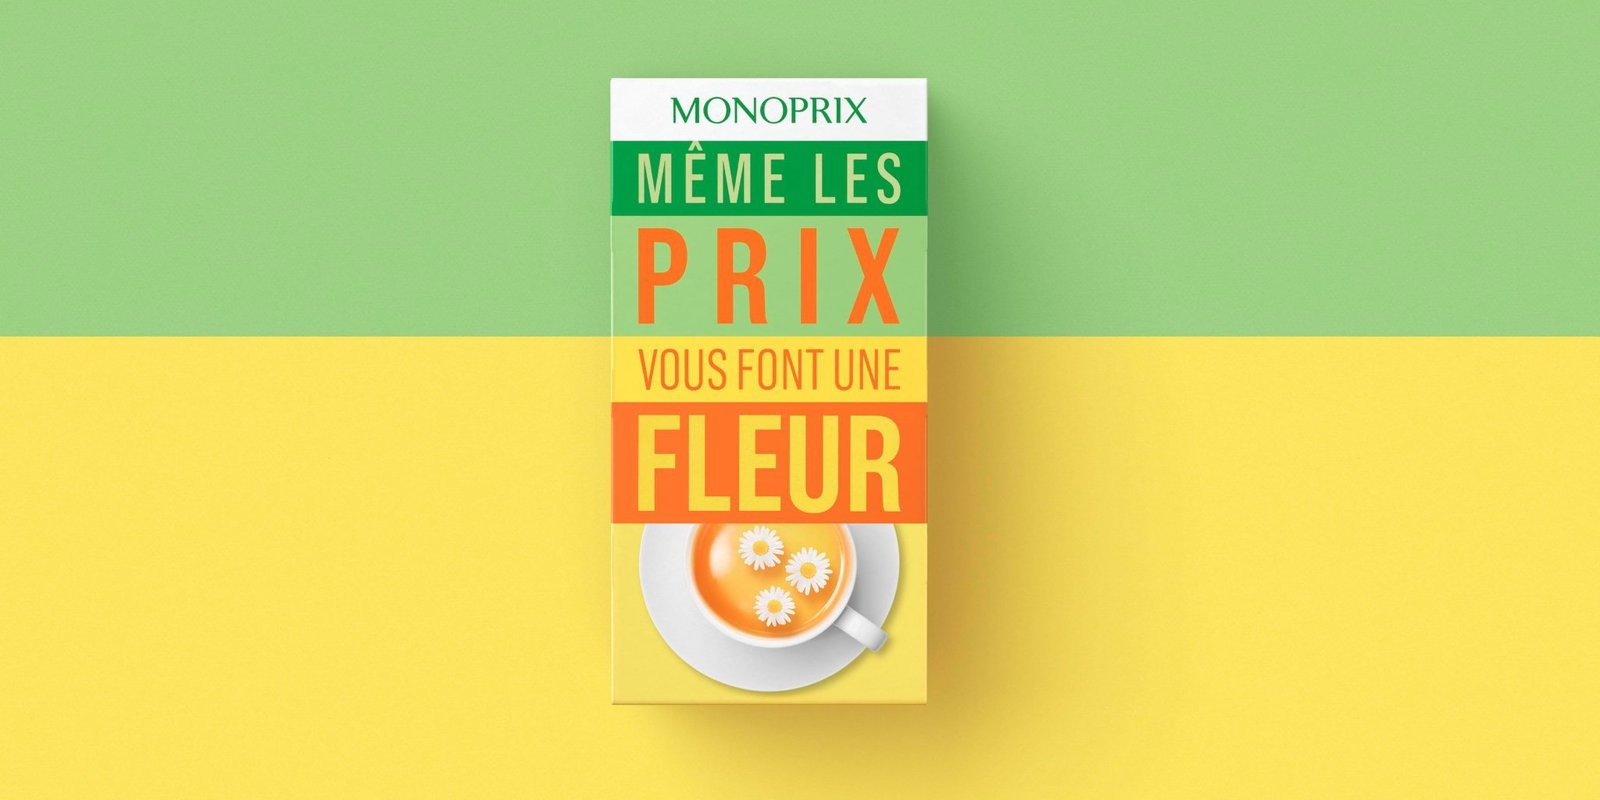 monoprix-mai-68-slogans-prix-revolution-publicite-marketing-print-affichage-agence-rosapark-6